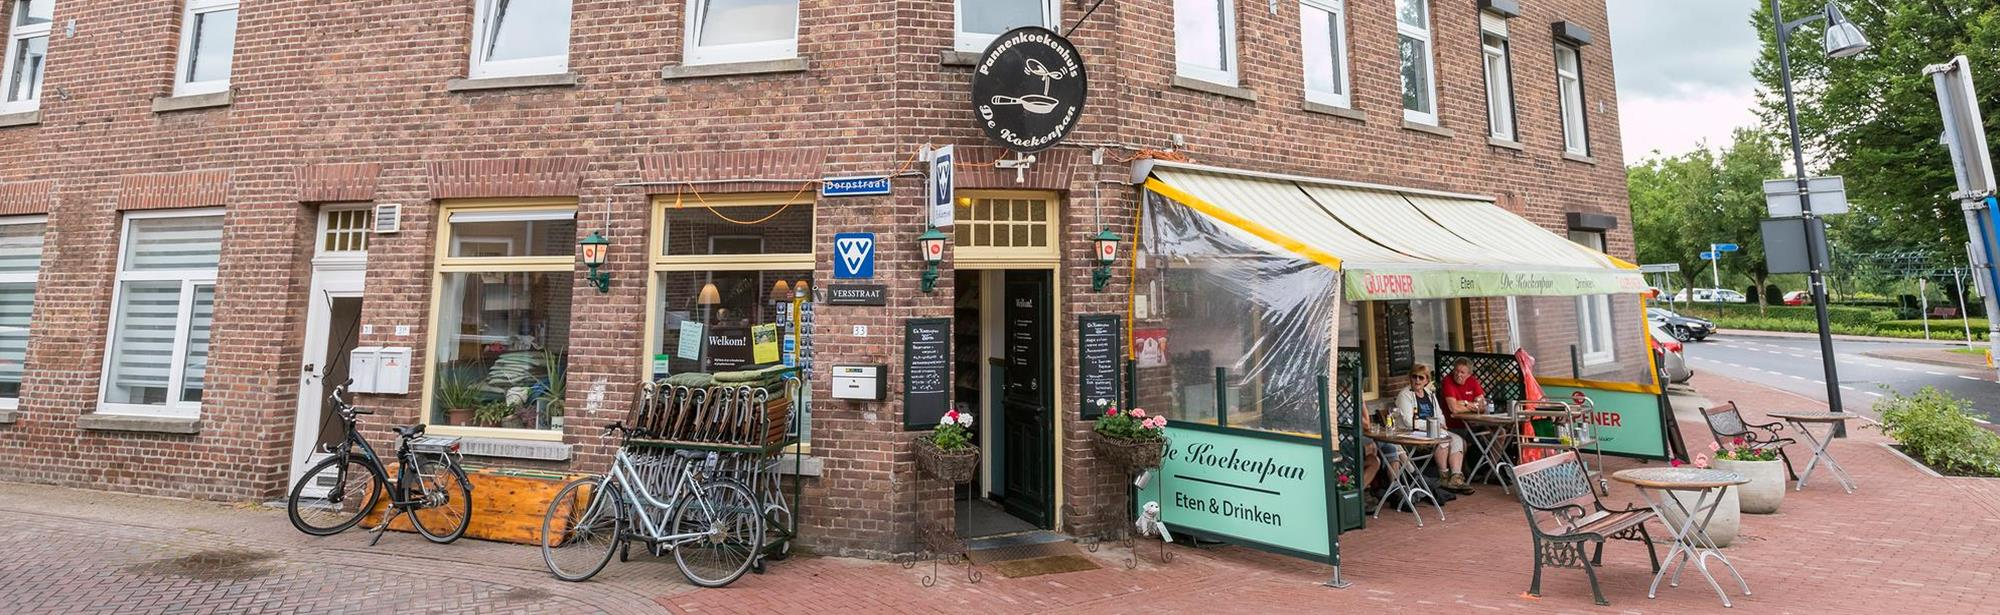 Visit Zuid-Limburg Folderpost St. Geertruid, Rest. De Koekenpan